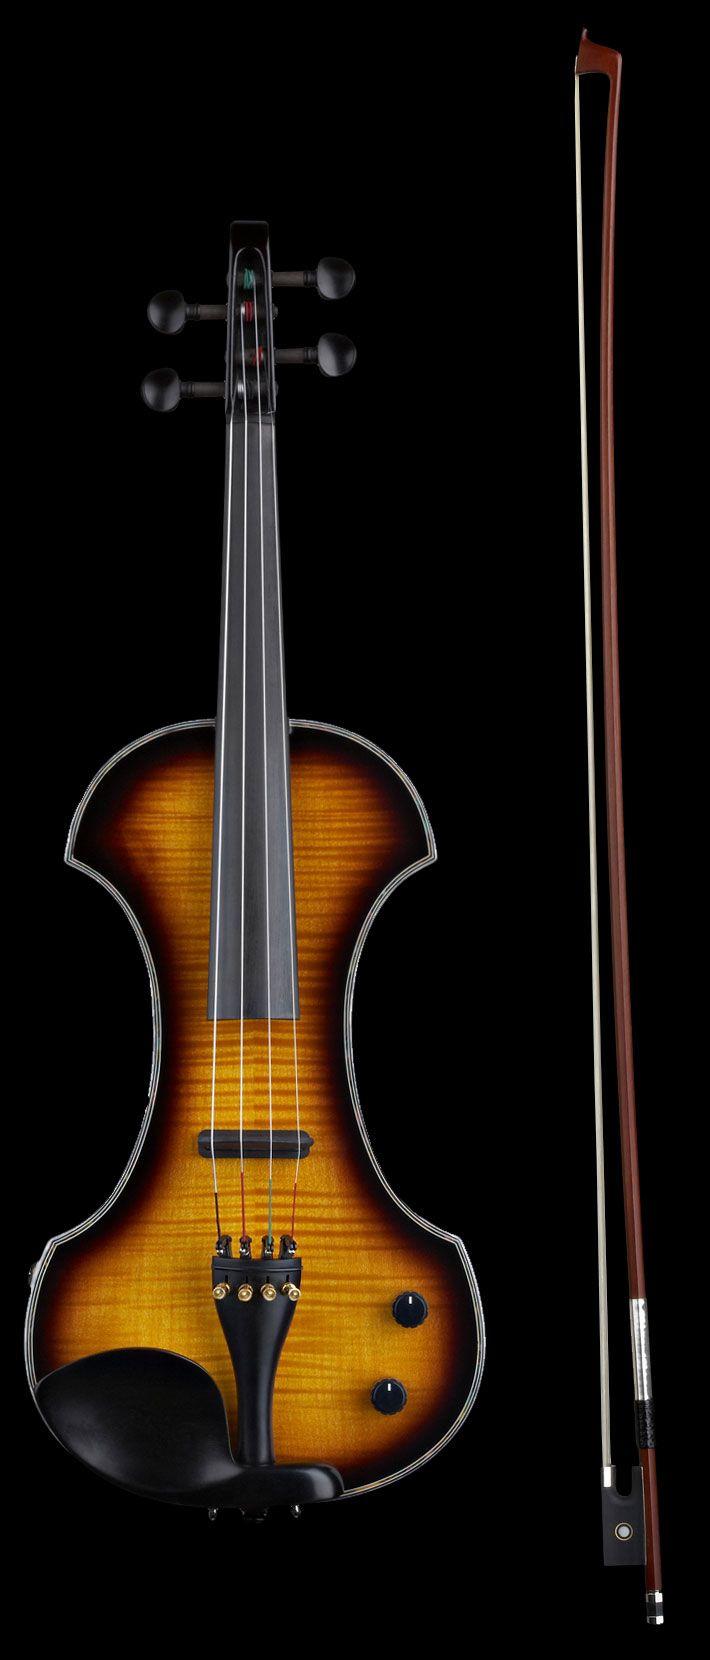 Fender Electric Violin  5/21/2012